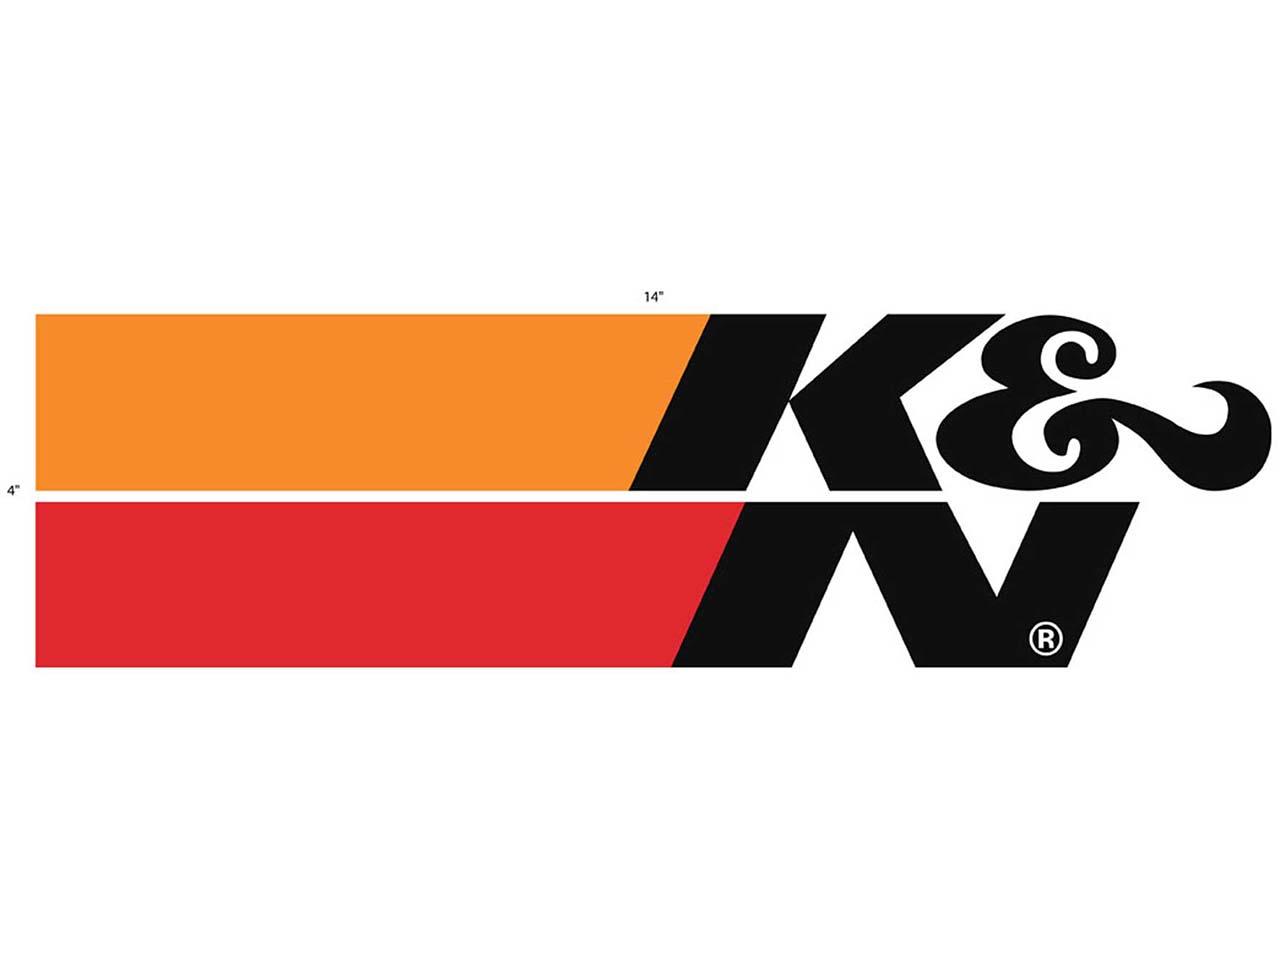 Pretentious N Air Filter Problems K Atv K N Air Filter Kit Atvs Performance Air Filters houzz-03 K And N Air Filter